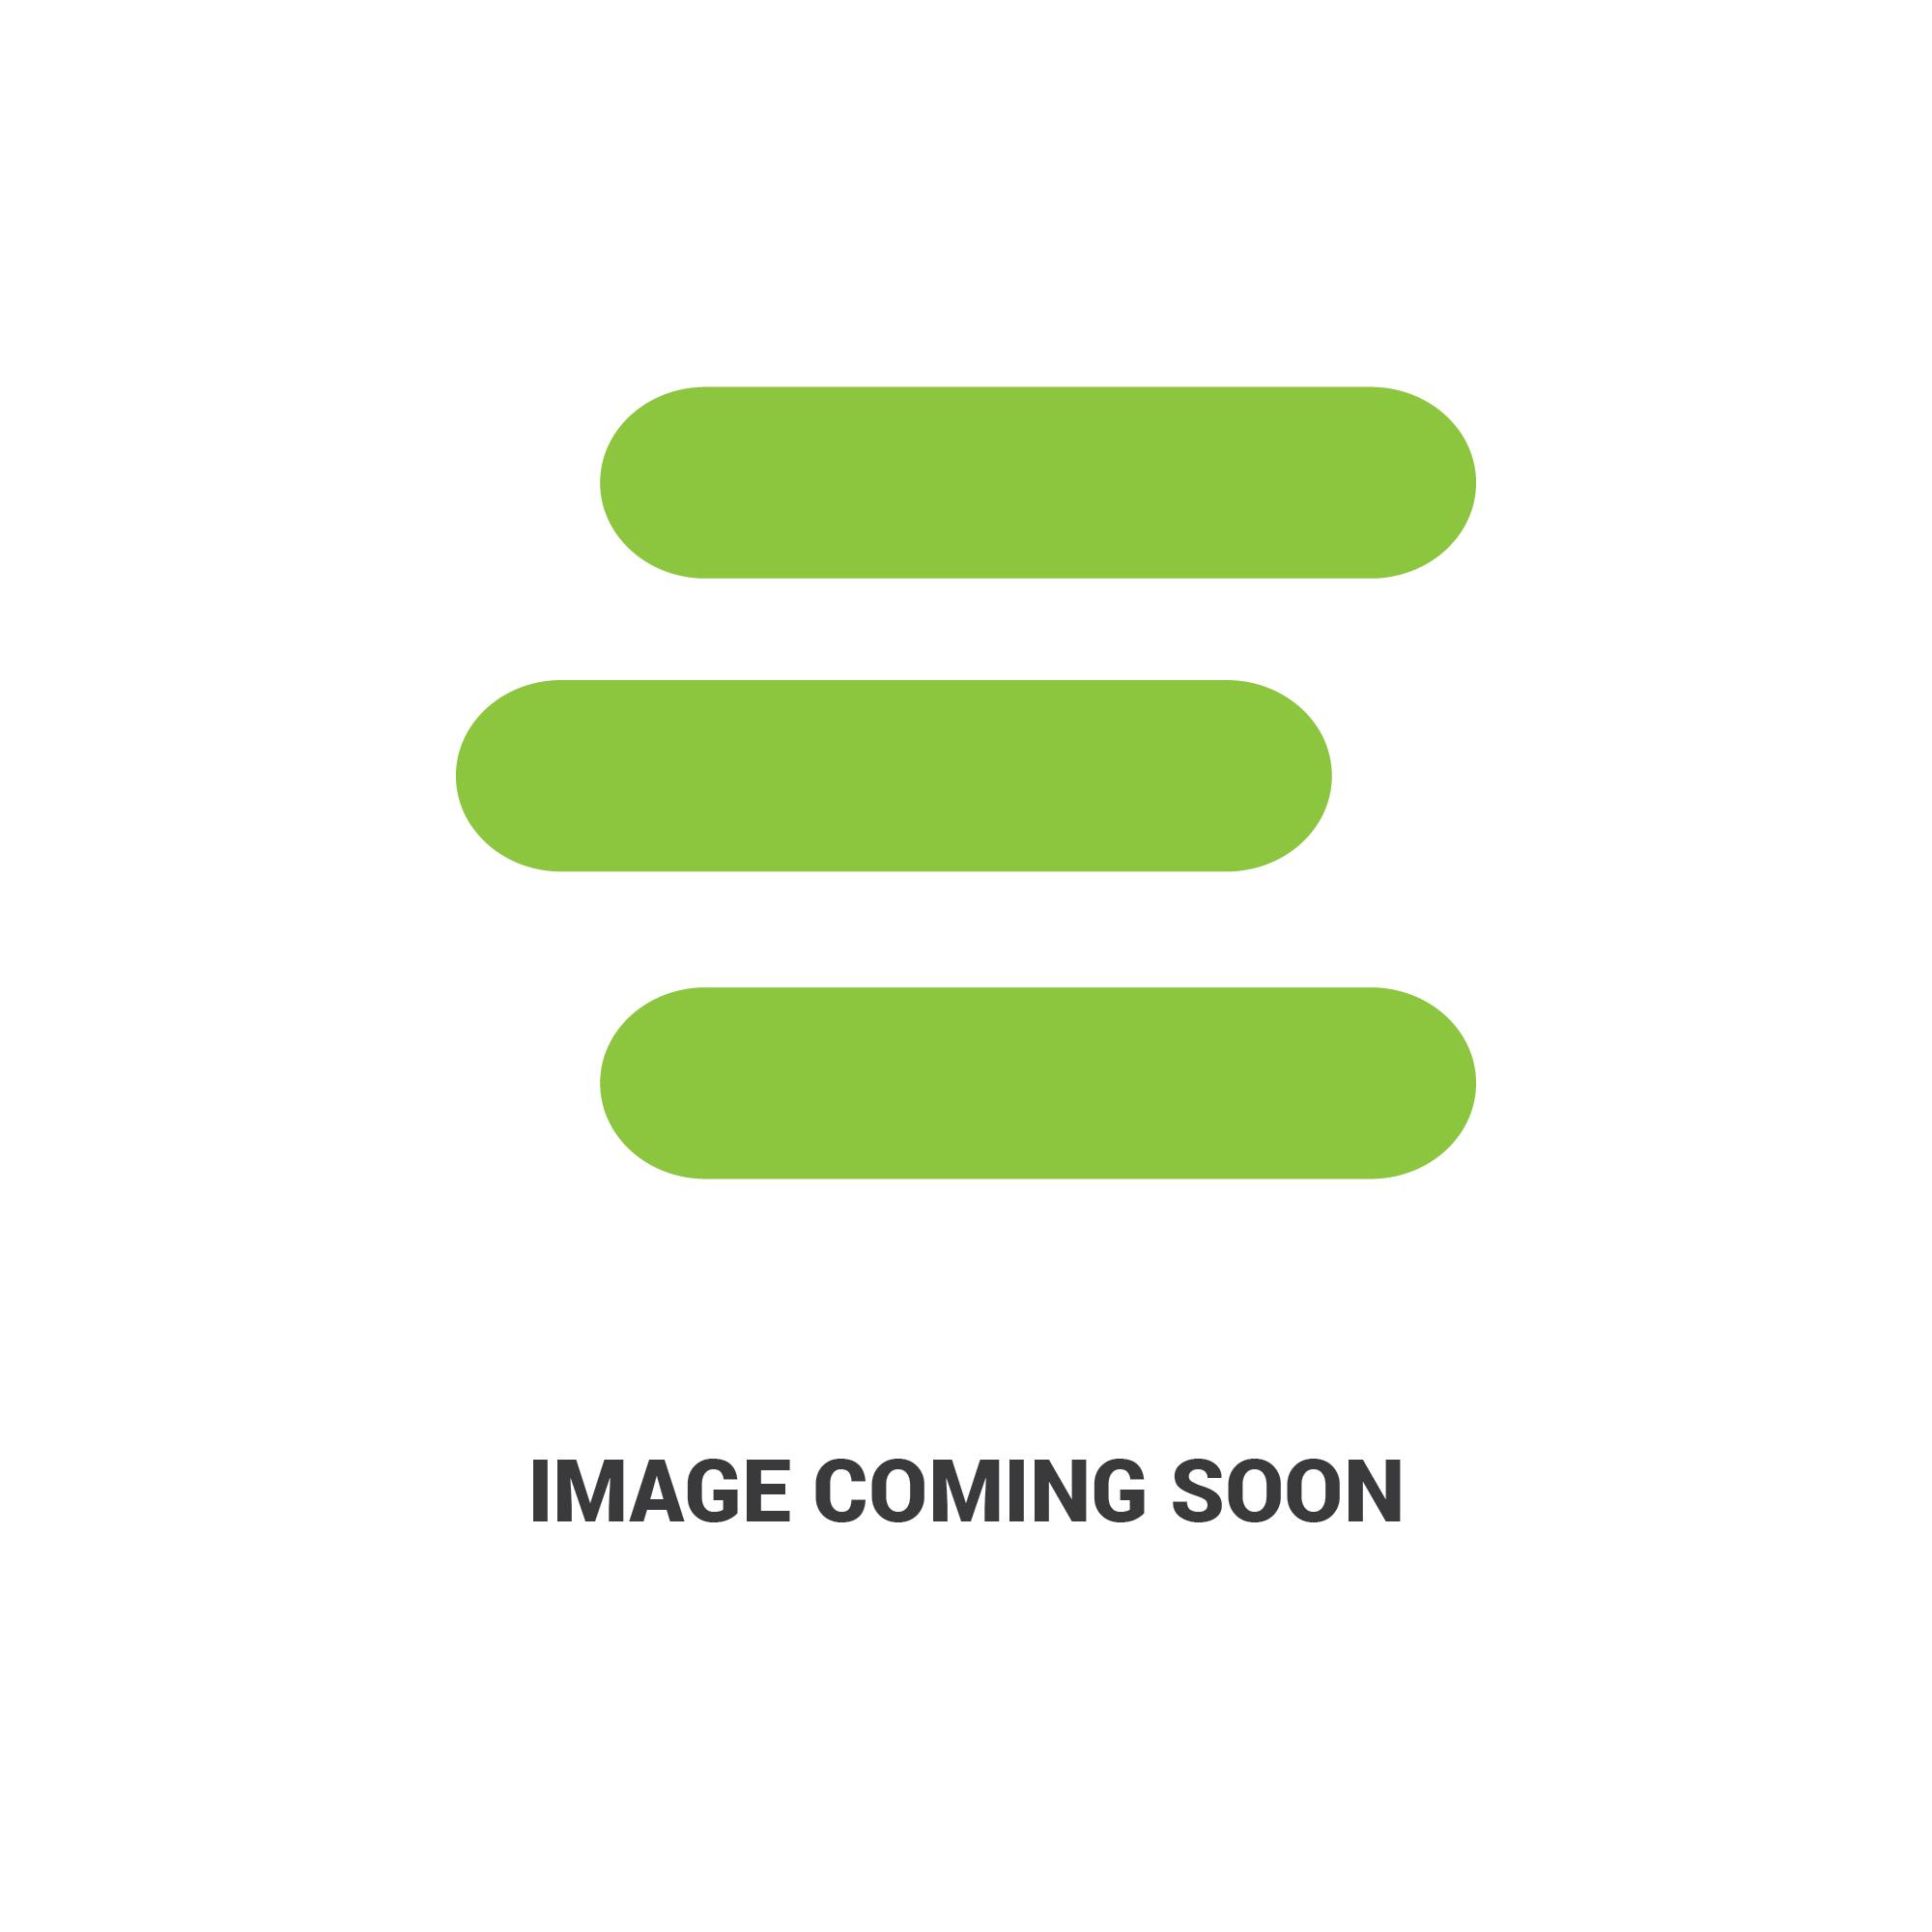 E-70226126edit 1.jpg